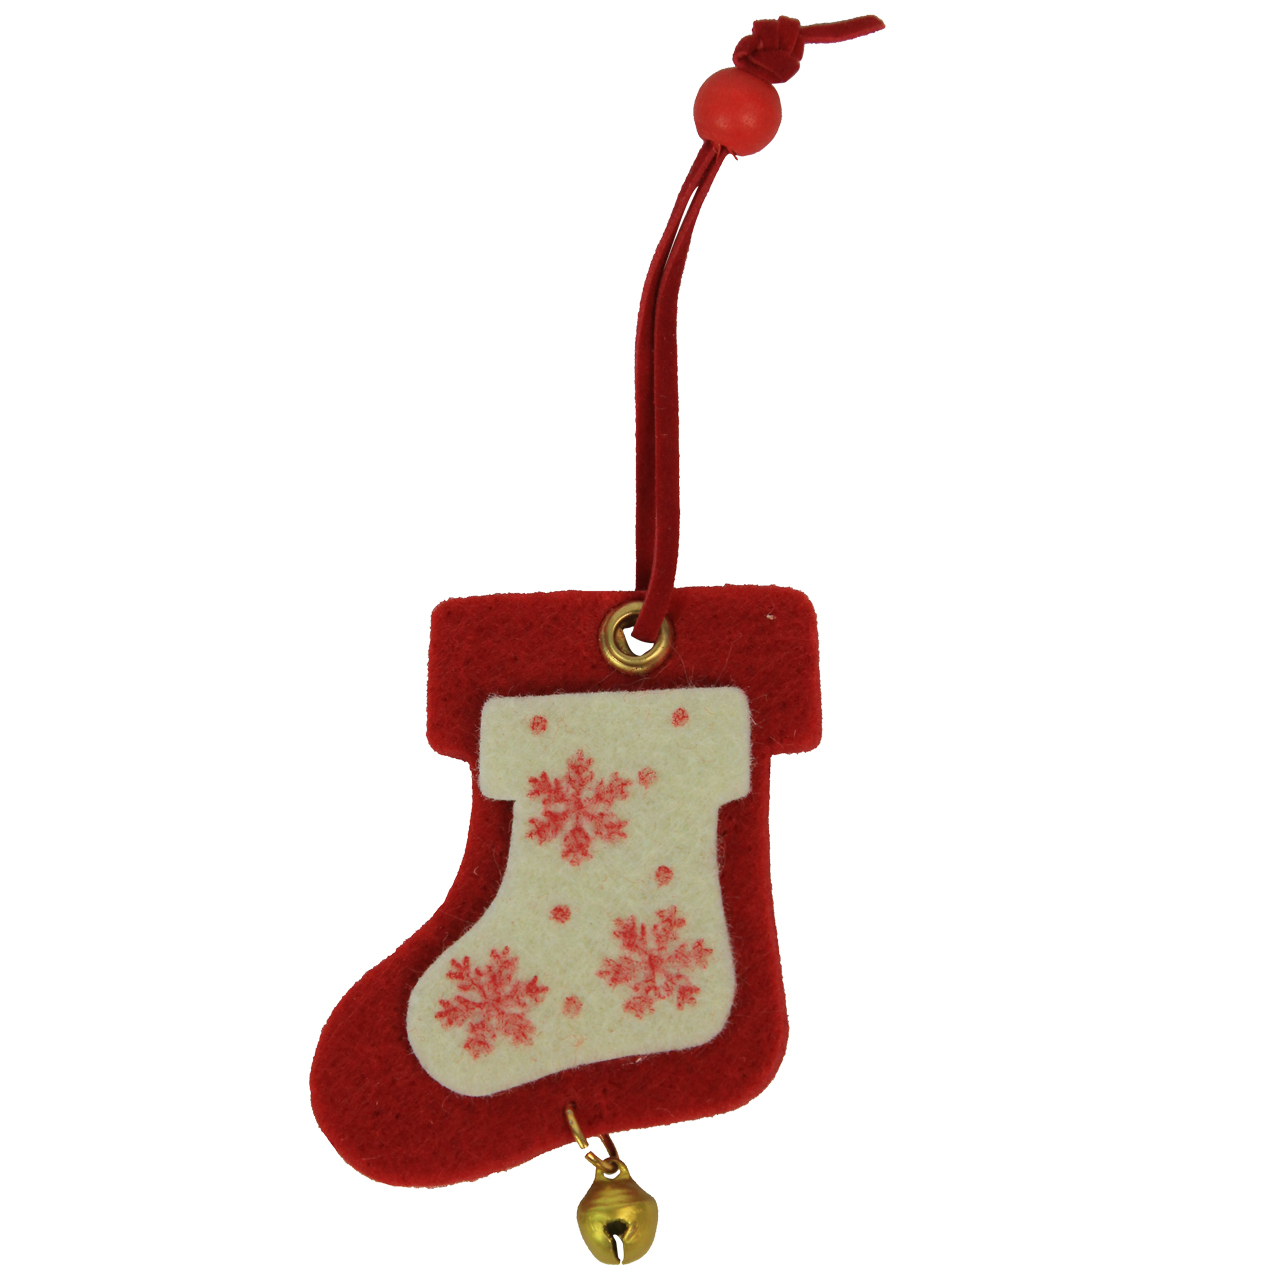 Decoratiune Ciorap De Craciun Din Textil Rosu Cu Alb 7 Cm